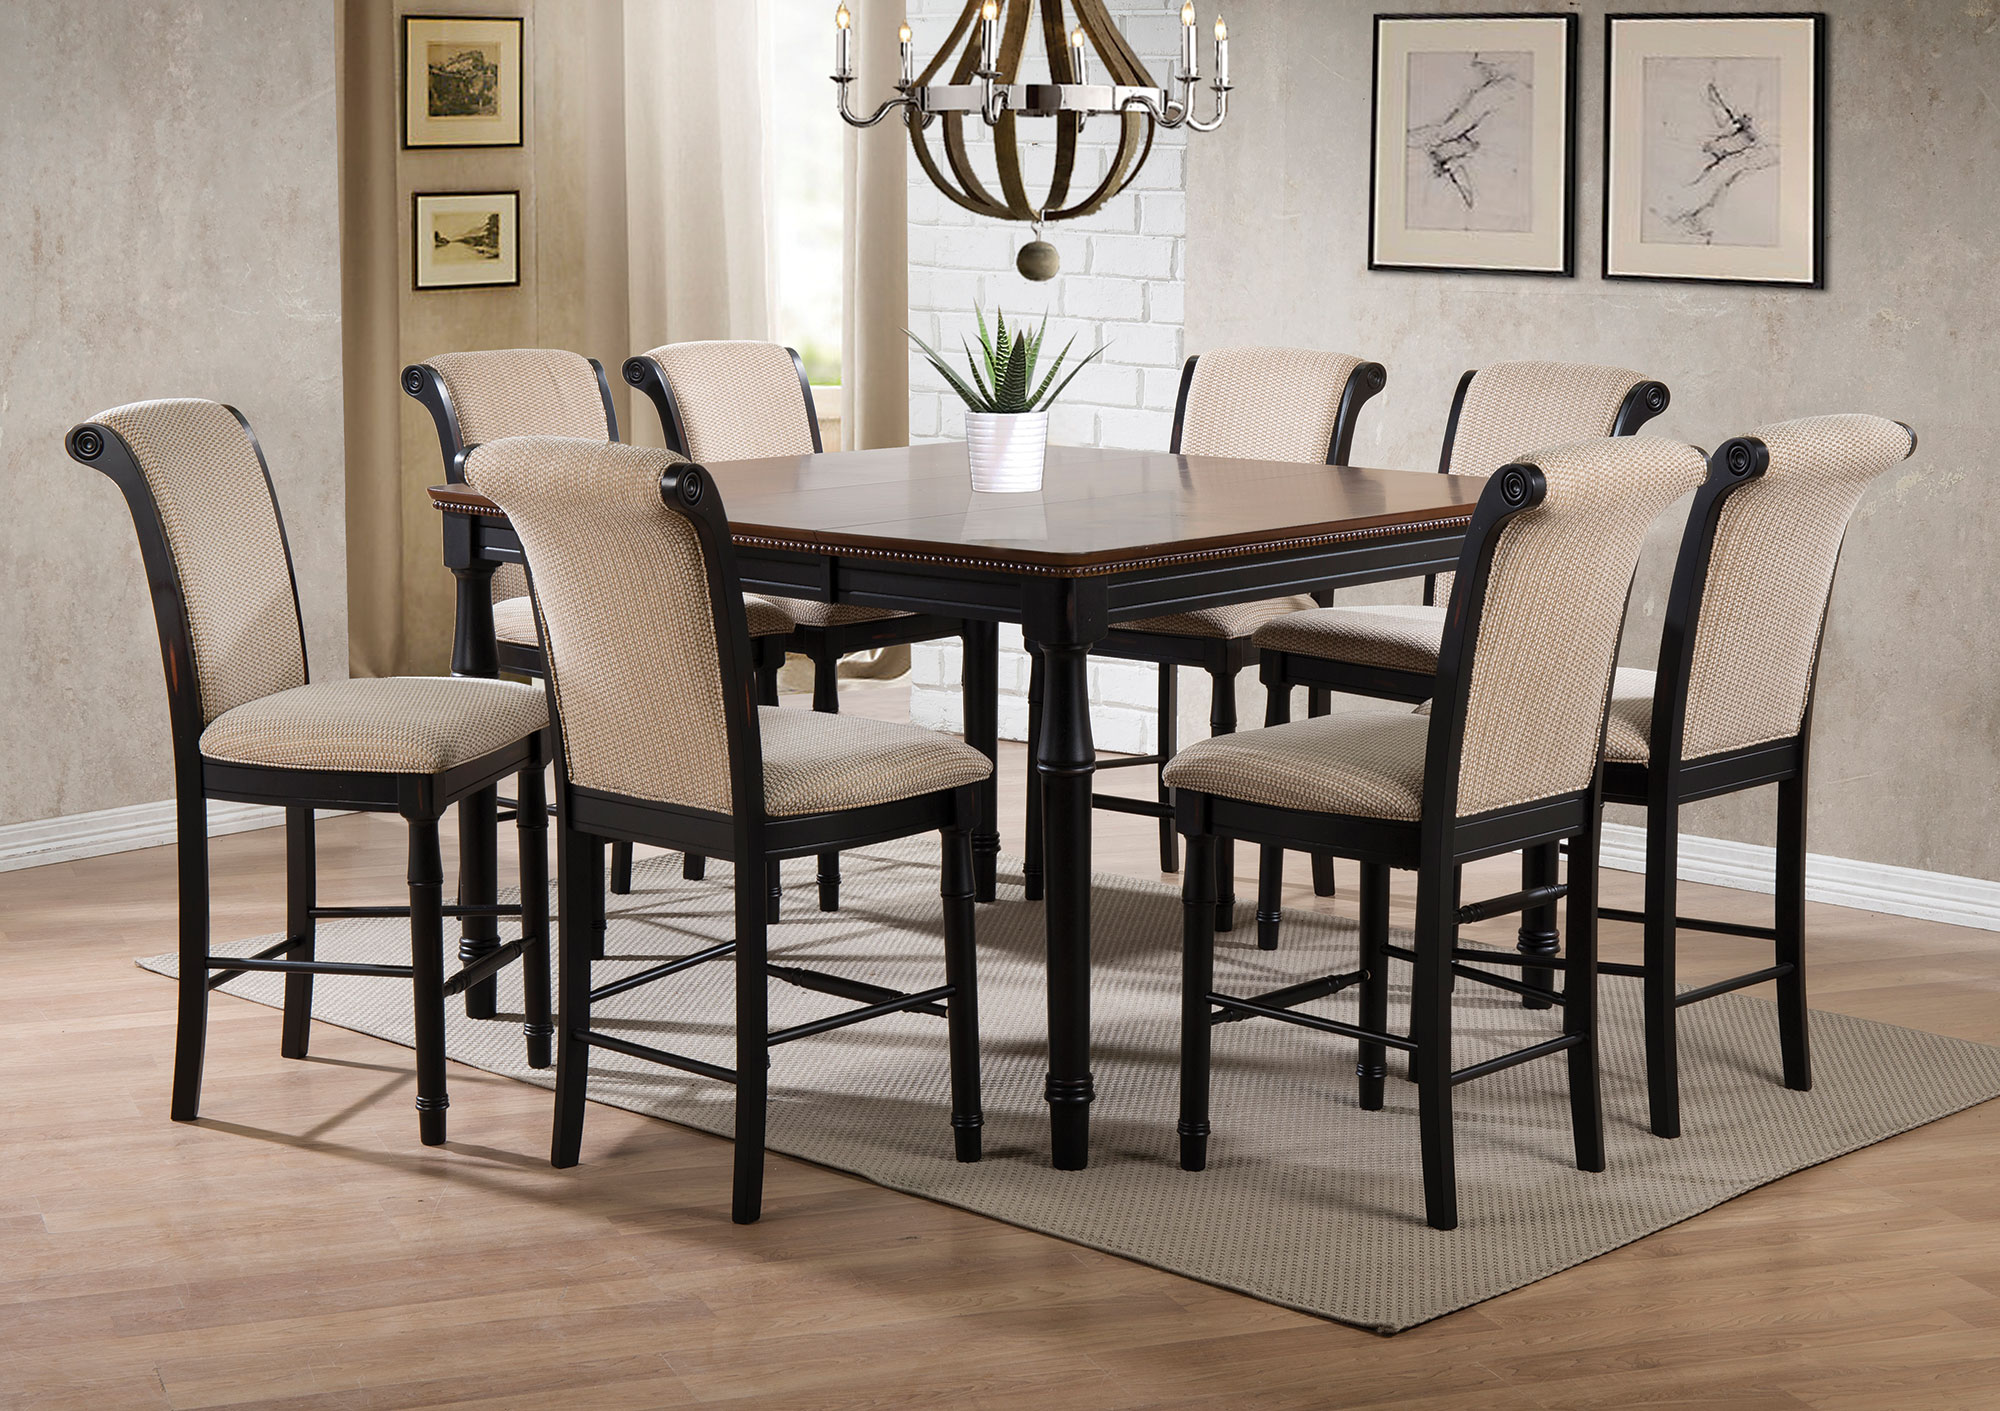 Coaster Company Cabrillo Counter Height Dining Table Amaretto And Black Walmart Com Walmart Com